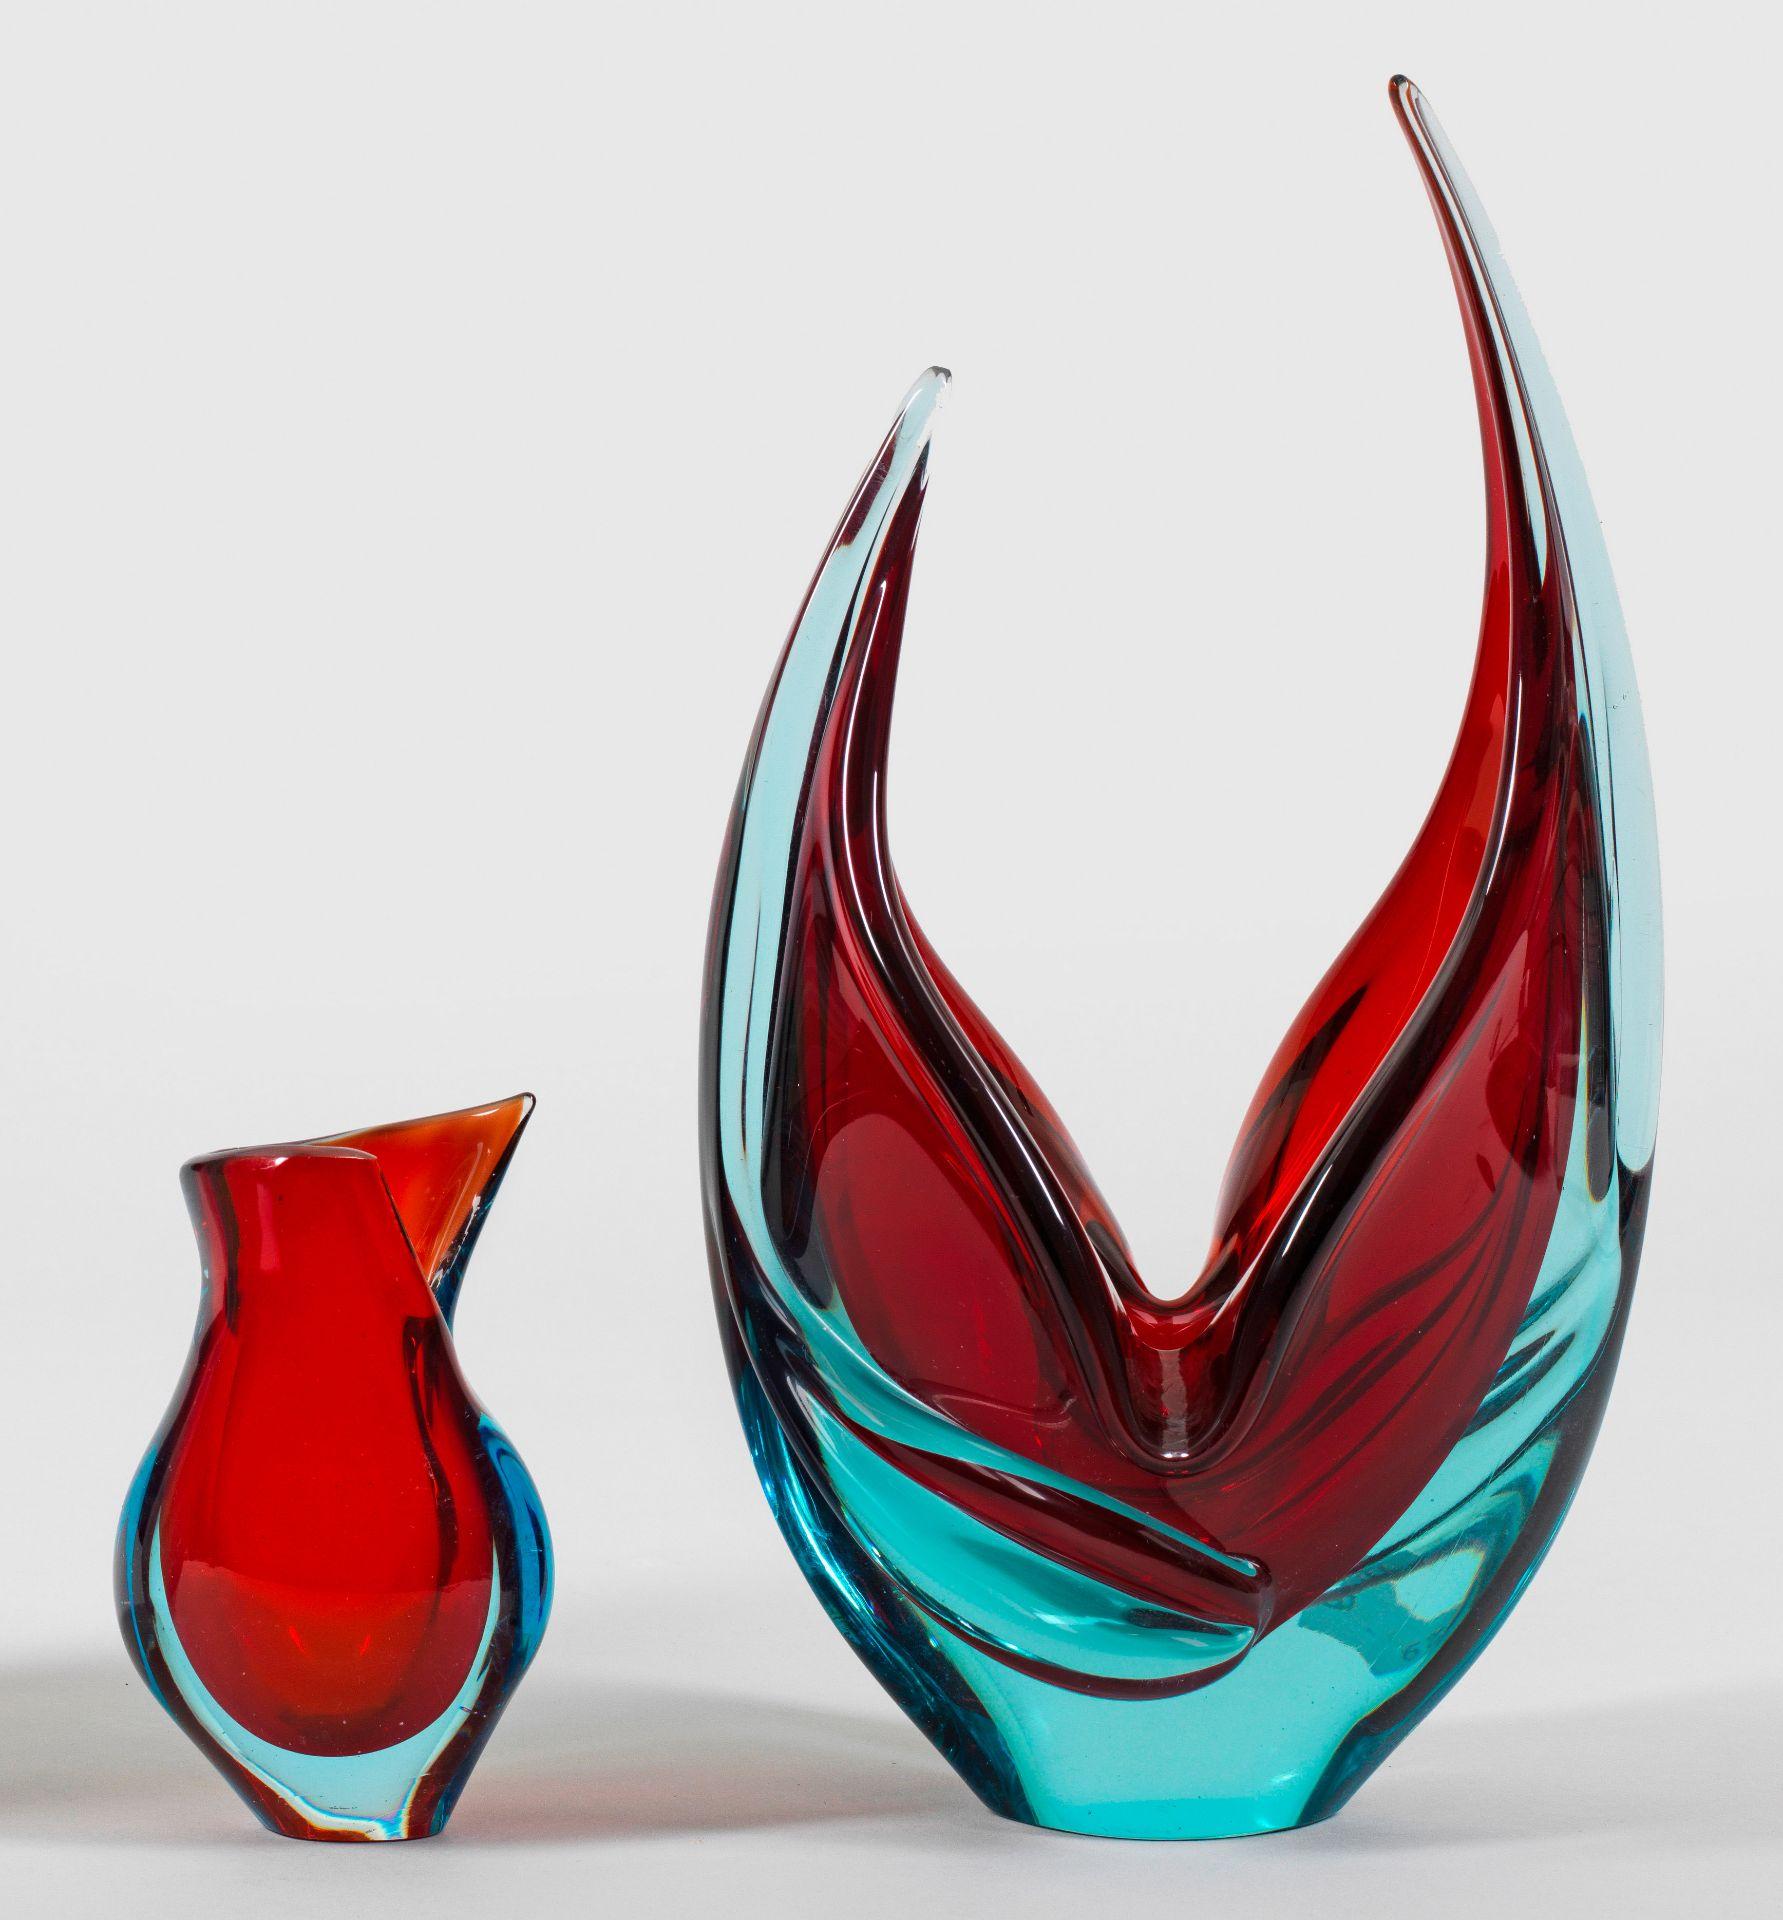 Zwei moderne Murano-Glasvasen